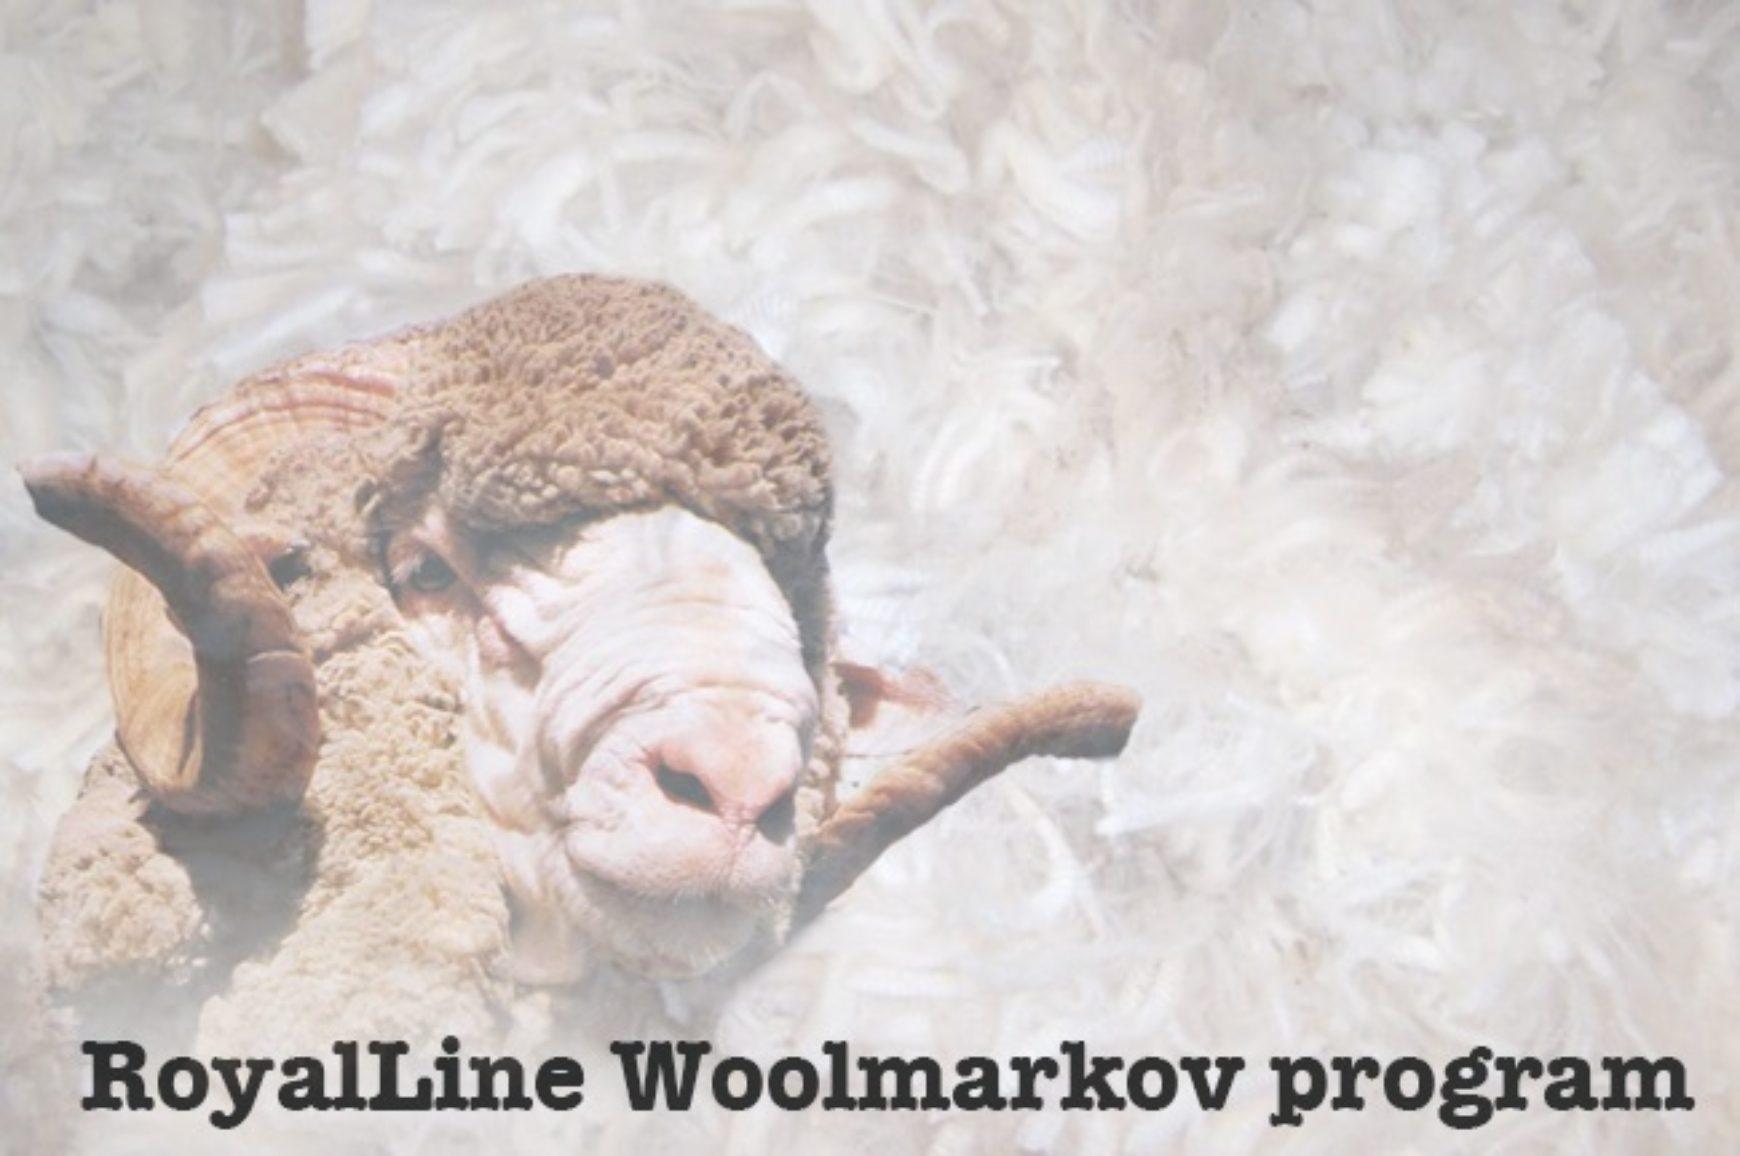 woolmark-royalline-3.jpg